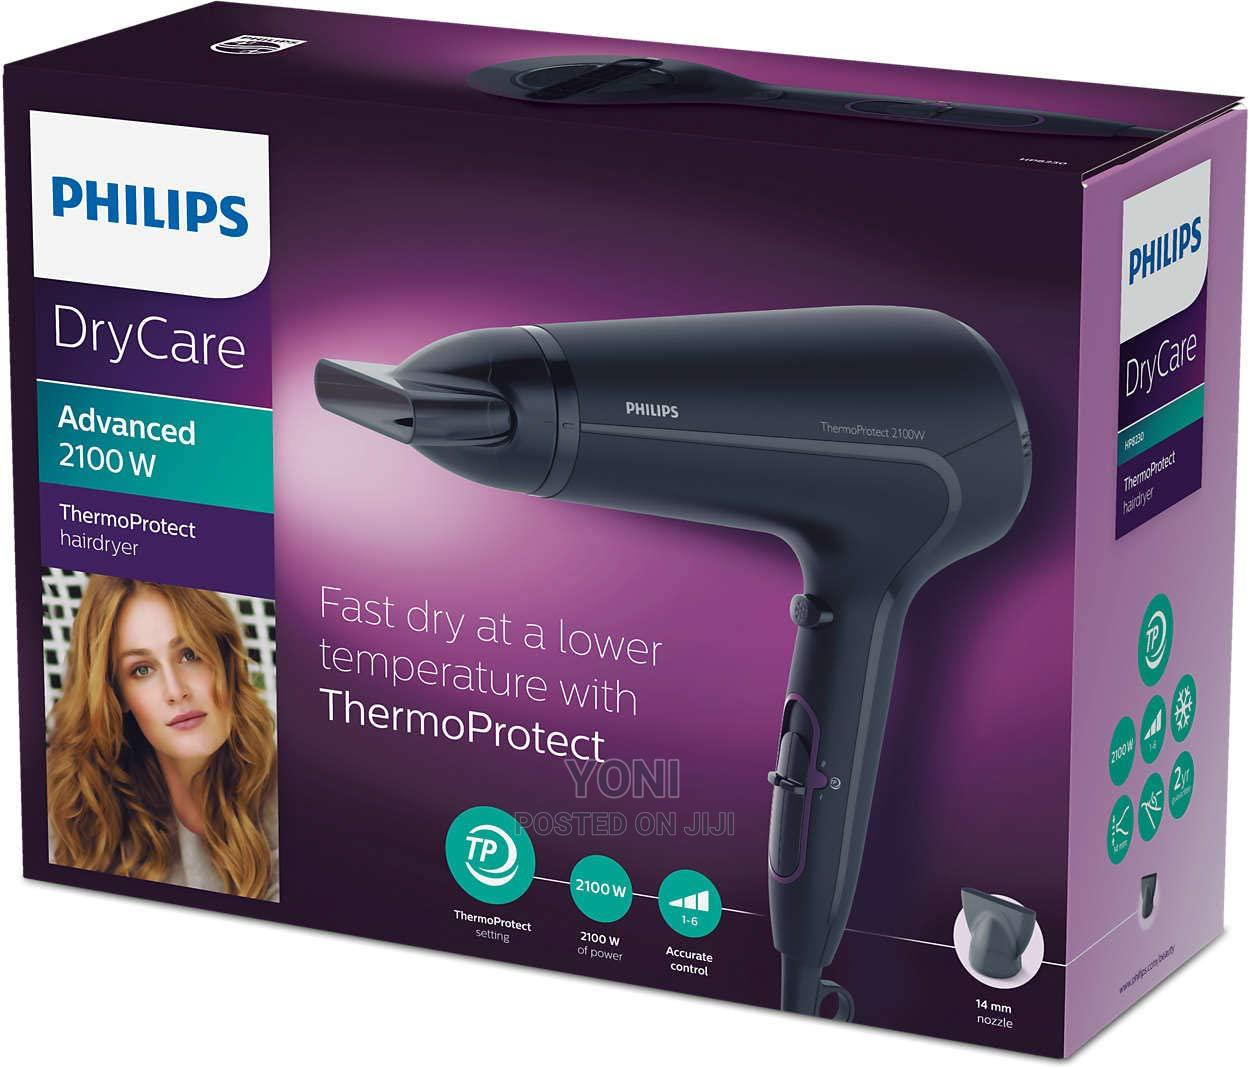 Philips Hair Dryer 2100 Watt/ ፊሊፕስ የጸጉር ማድረቂያ 2100 ዋት